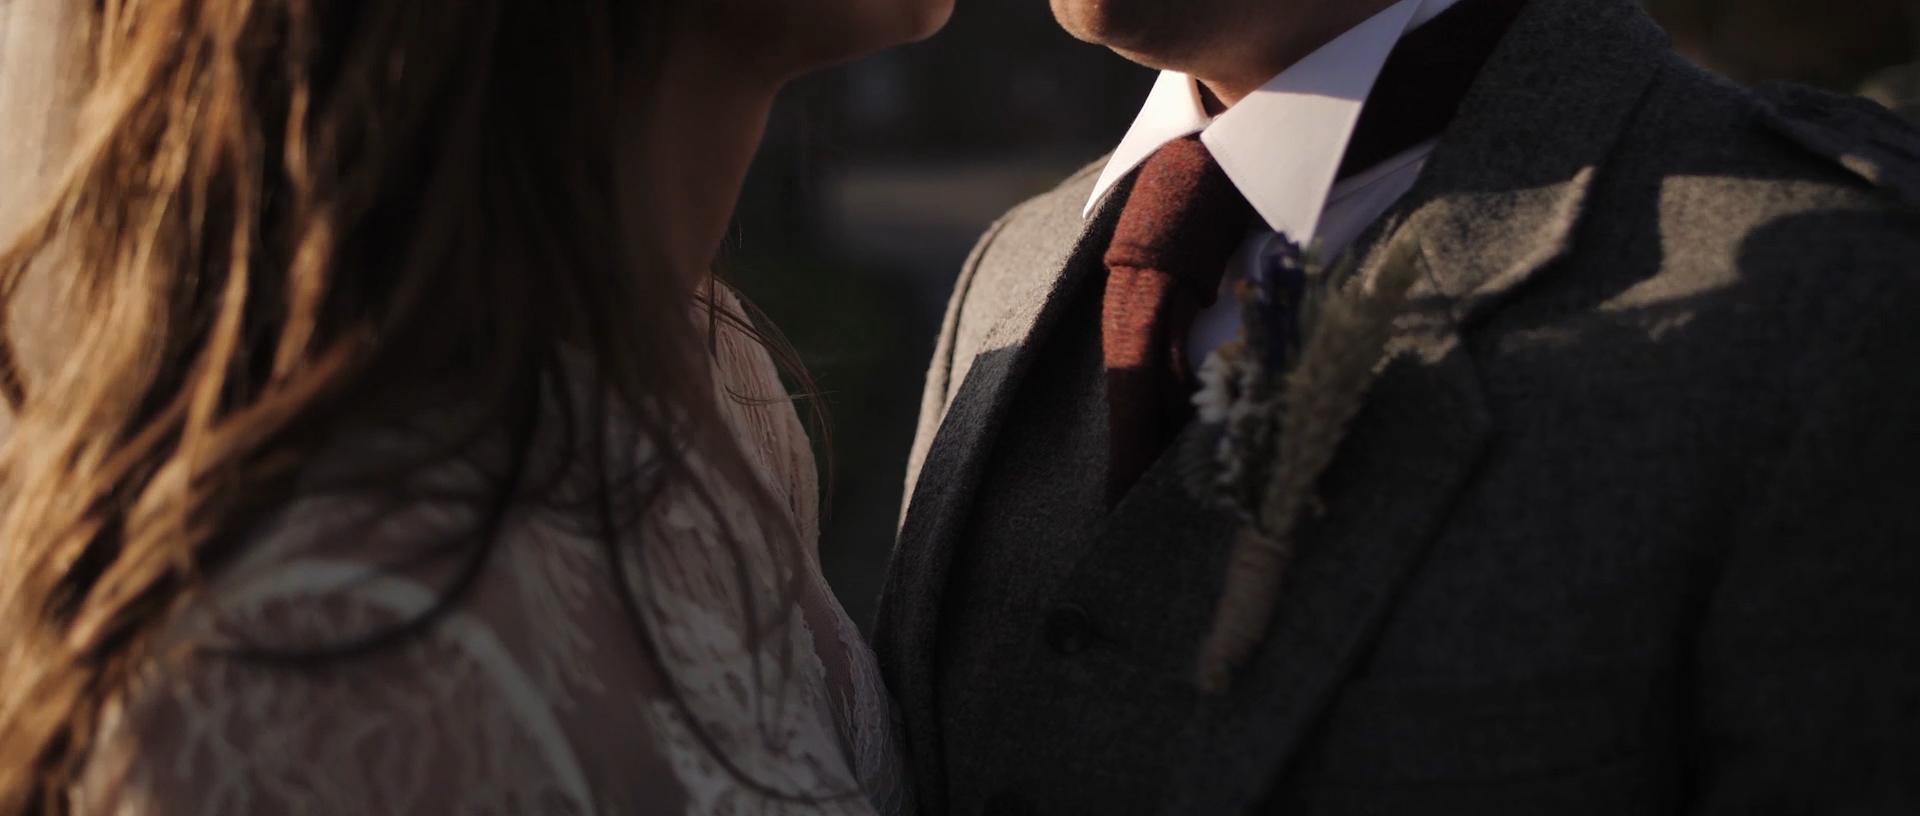 rowallan-castle-wedding-videographer_LL_04.jpg